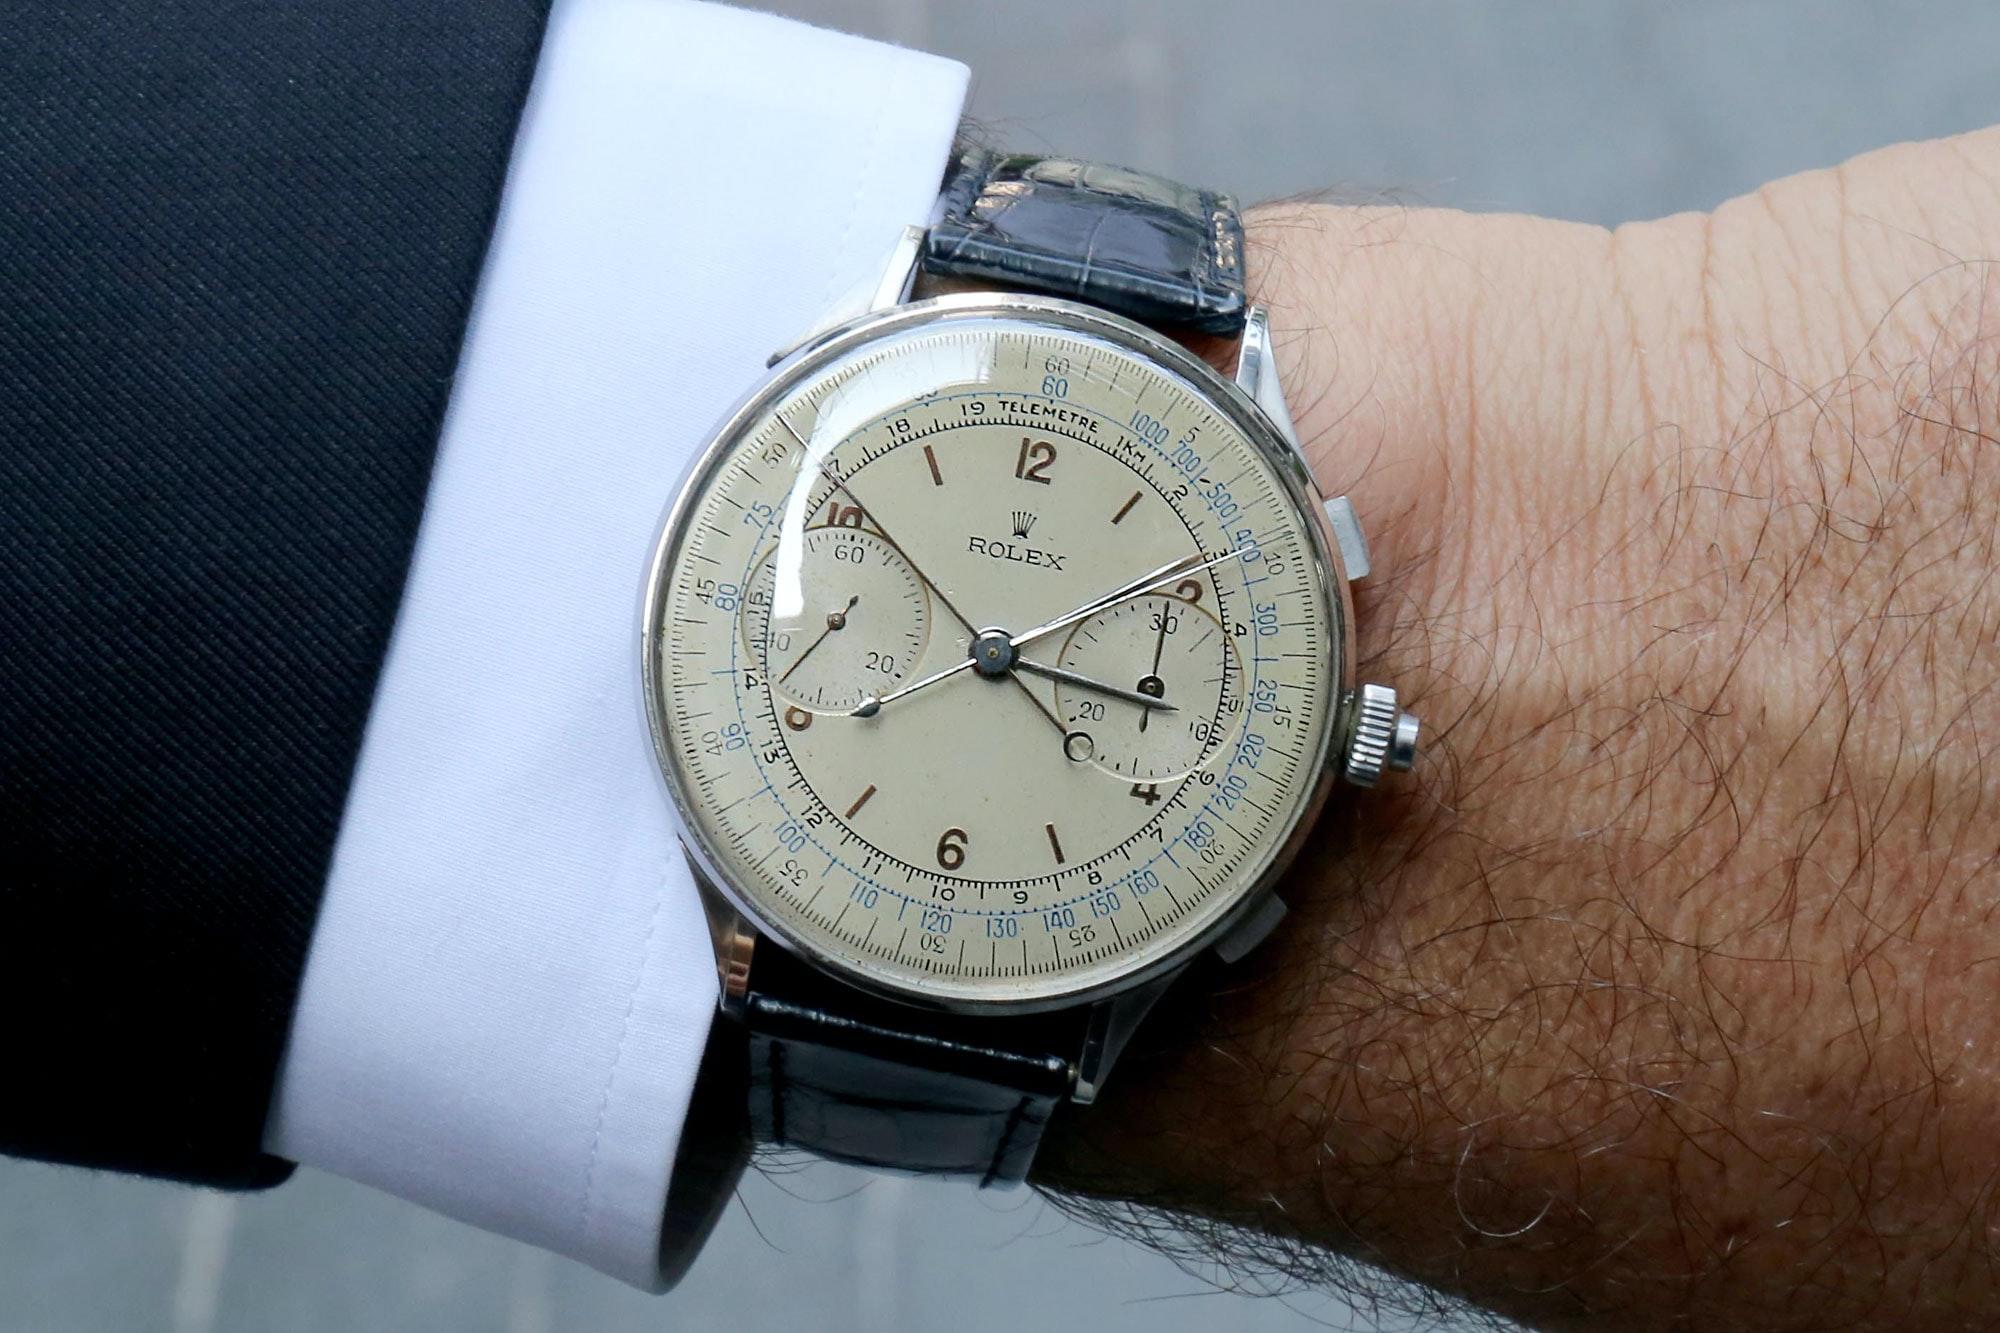 rolex ref. 4113 Watch Spotting: A Split-Seconds Rolex Ref. 4113, Casually Worn At Dubai Watch Week Watch Spotting: A Split-Seconds Rolex Ref. 4113, Casually Worn At Dubai Watch Week rolex